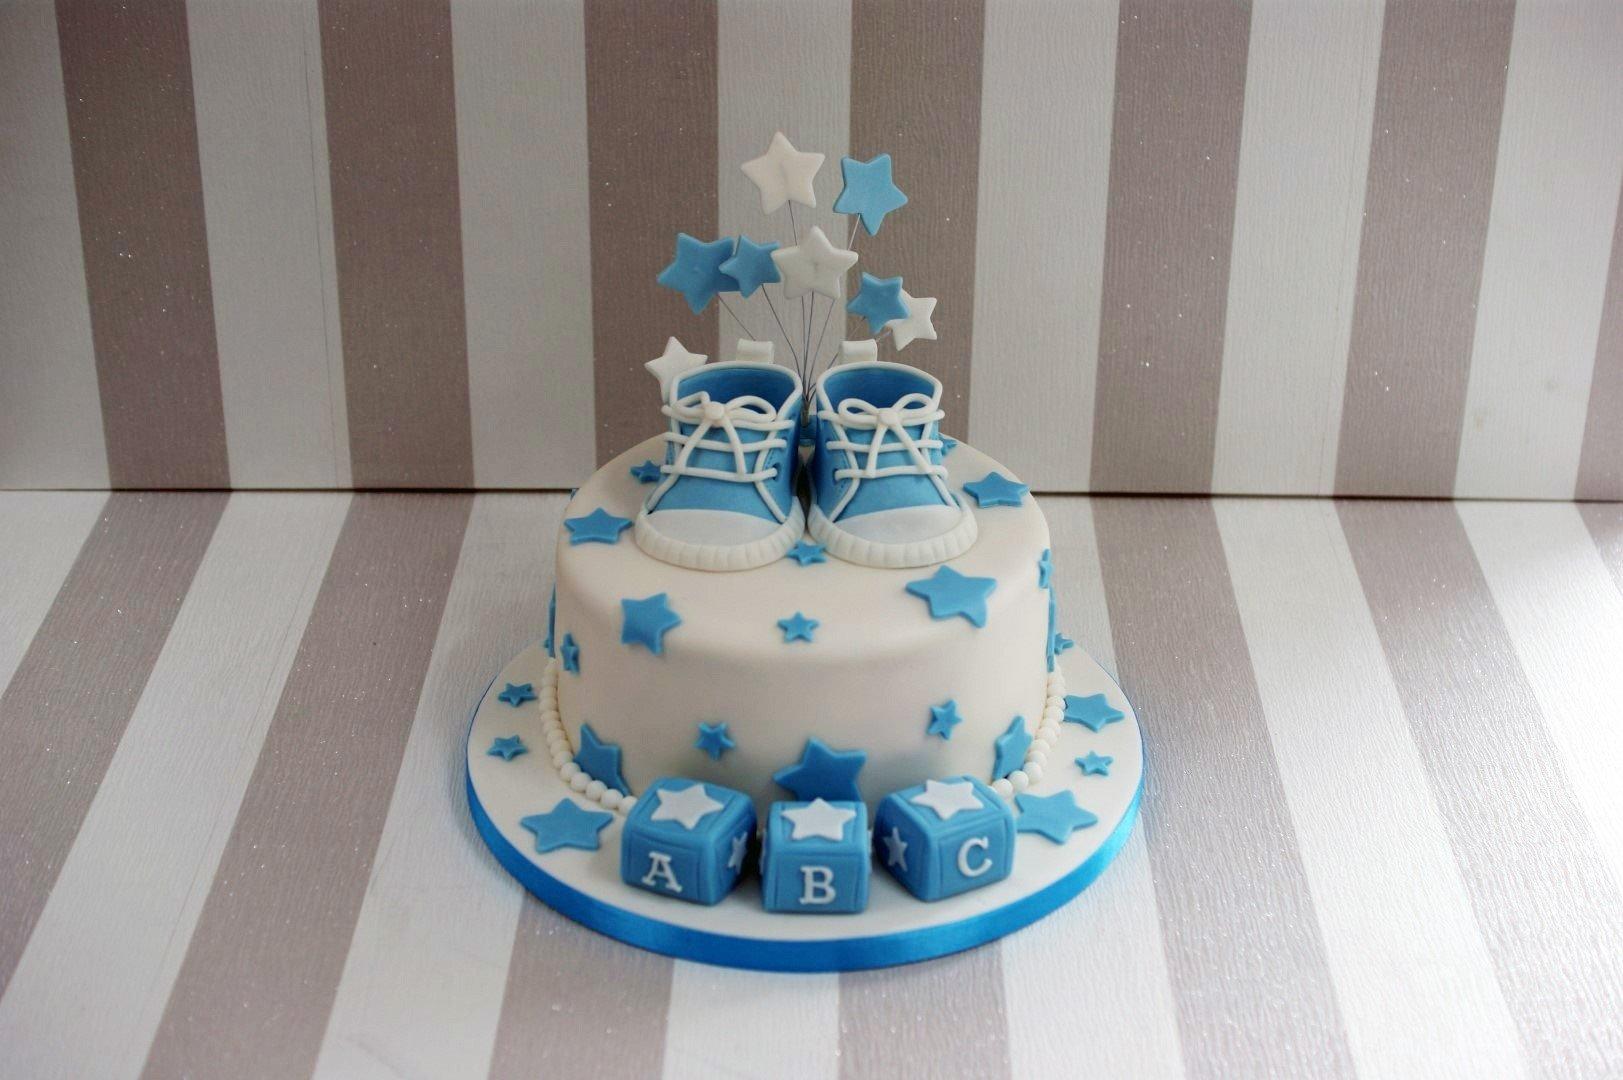 10 Stunning Baby Boy Baby Shower Cake Ideas baby shower cake designs for boy lovely boys baby shower cake with 2020